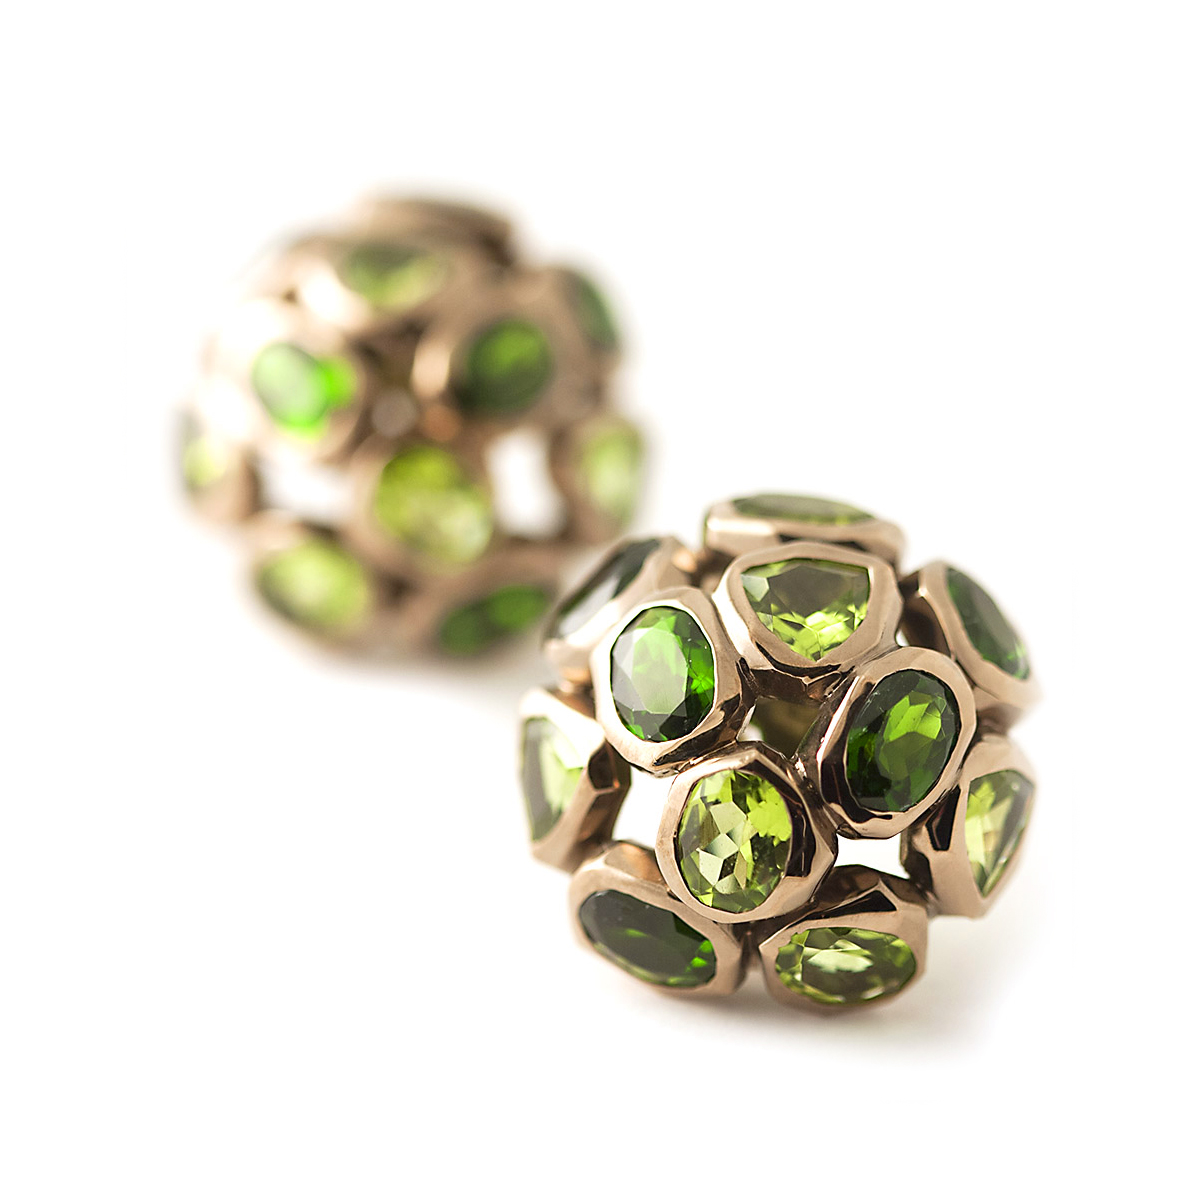 Mosaico earrings